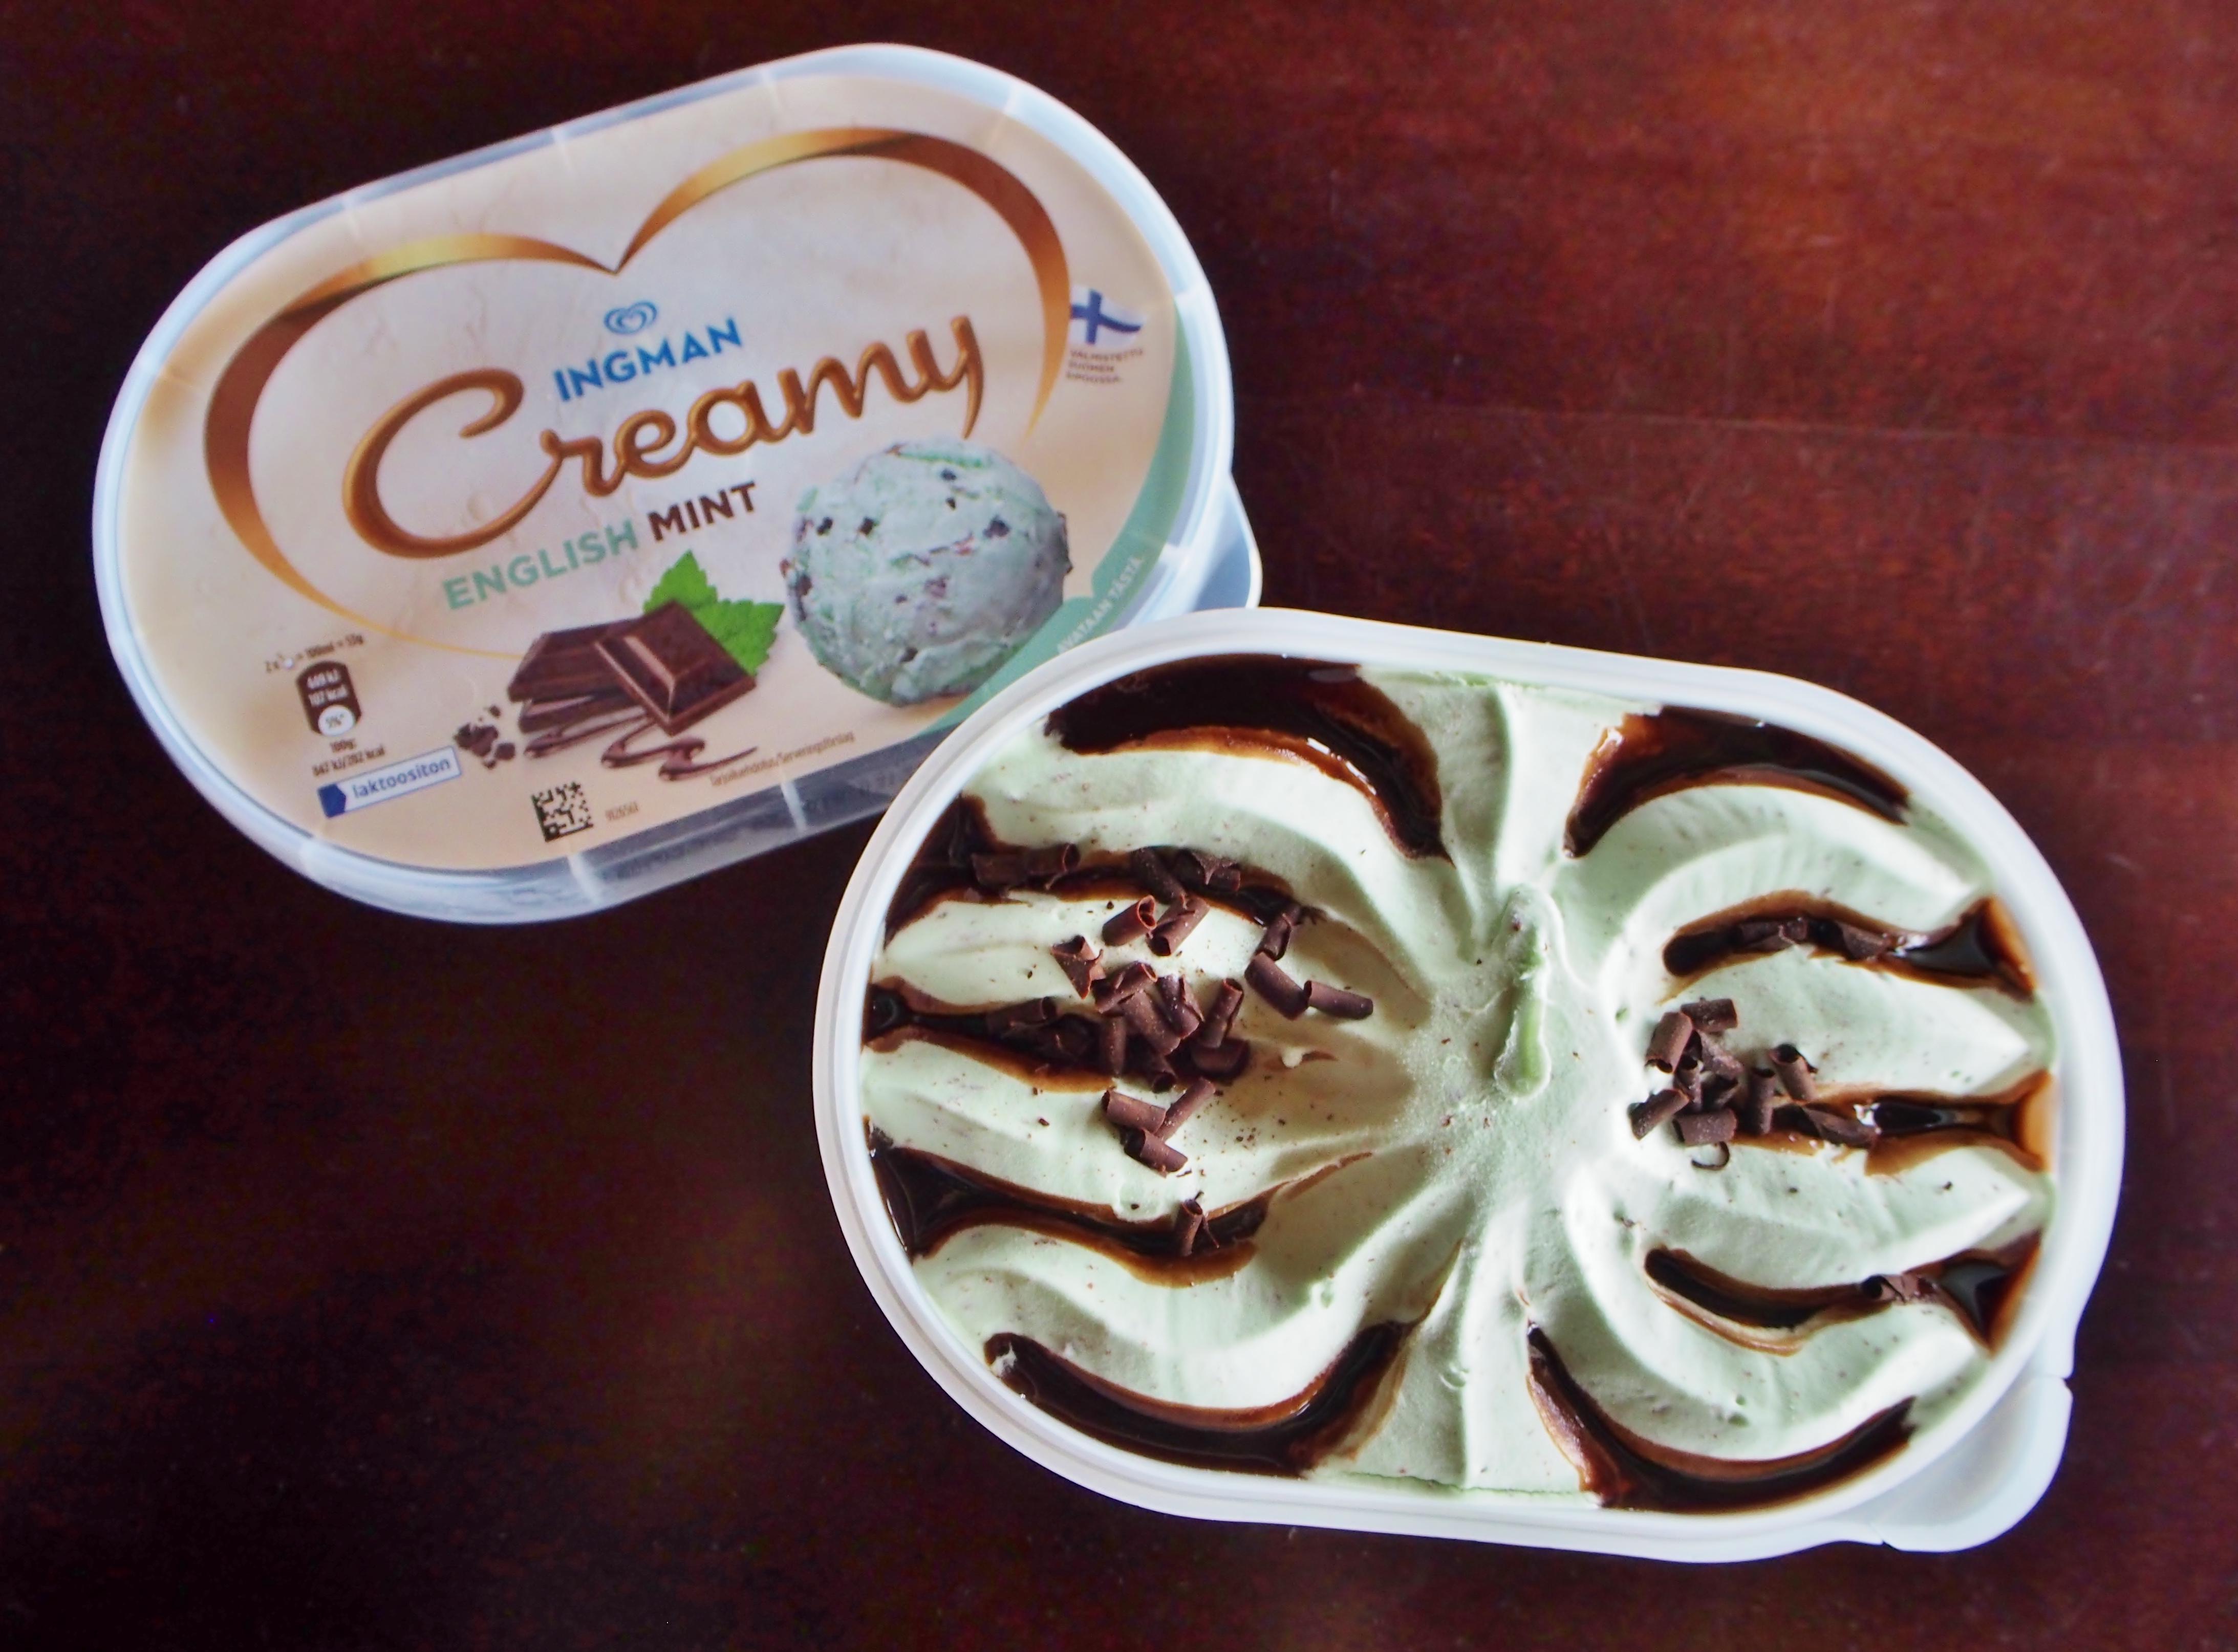 Ingman Creamy English Mint